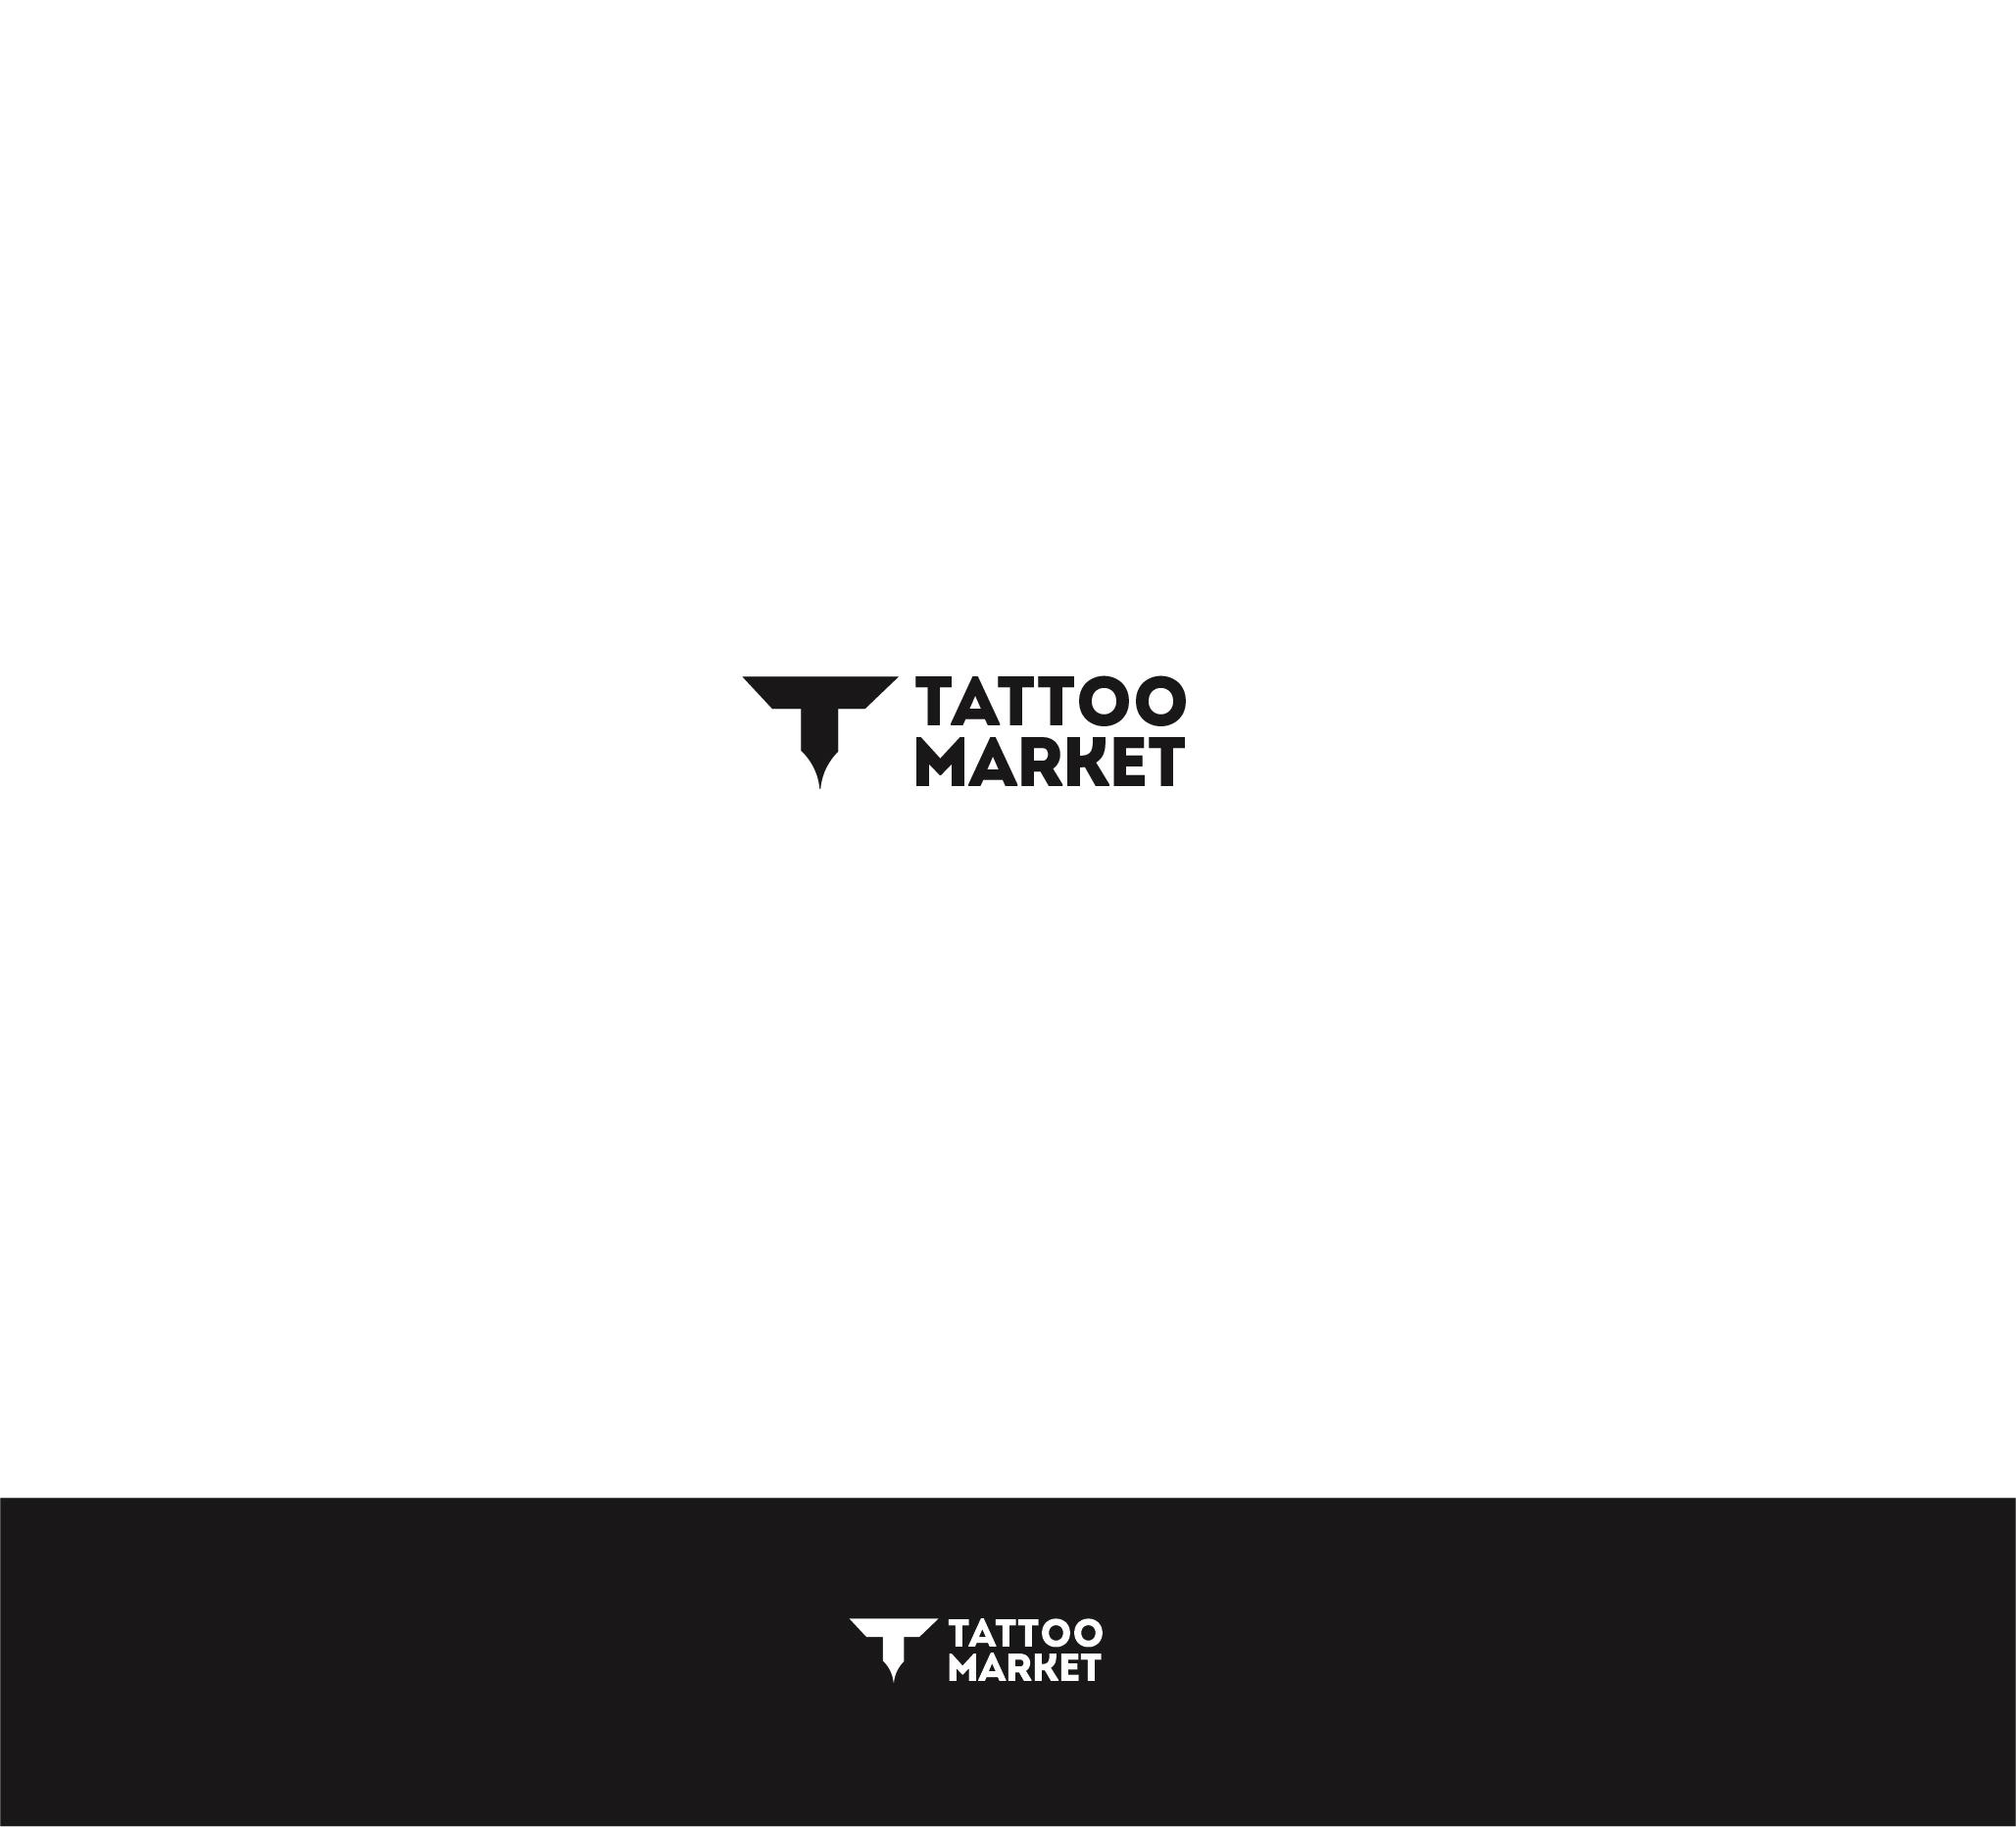 Редизайн логотипа магазина тату оборудования TattooMarket.ru фото f_1875c48cdc50eaa6.jpg